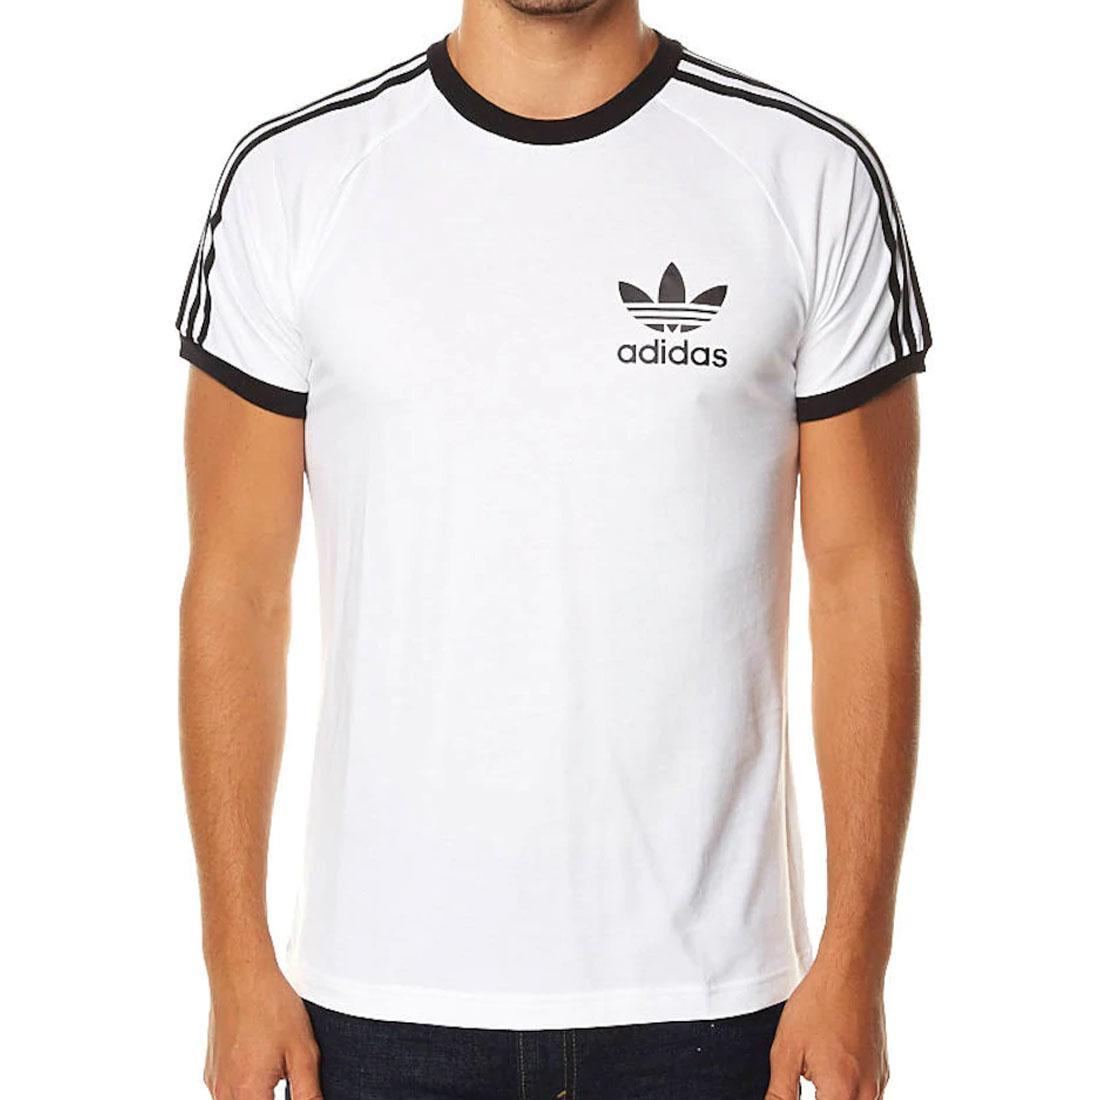 Details about adidas originals T Shirt Ess Essentials Sport Tee Mens White Black Crew 3 Stripe